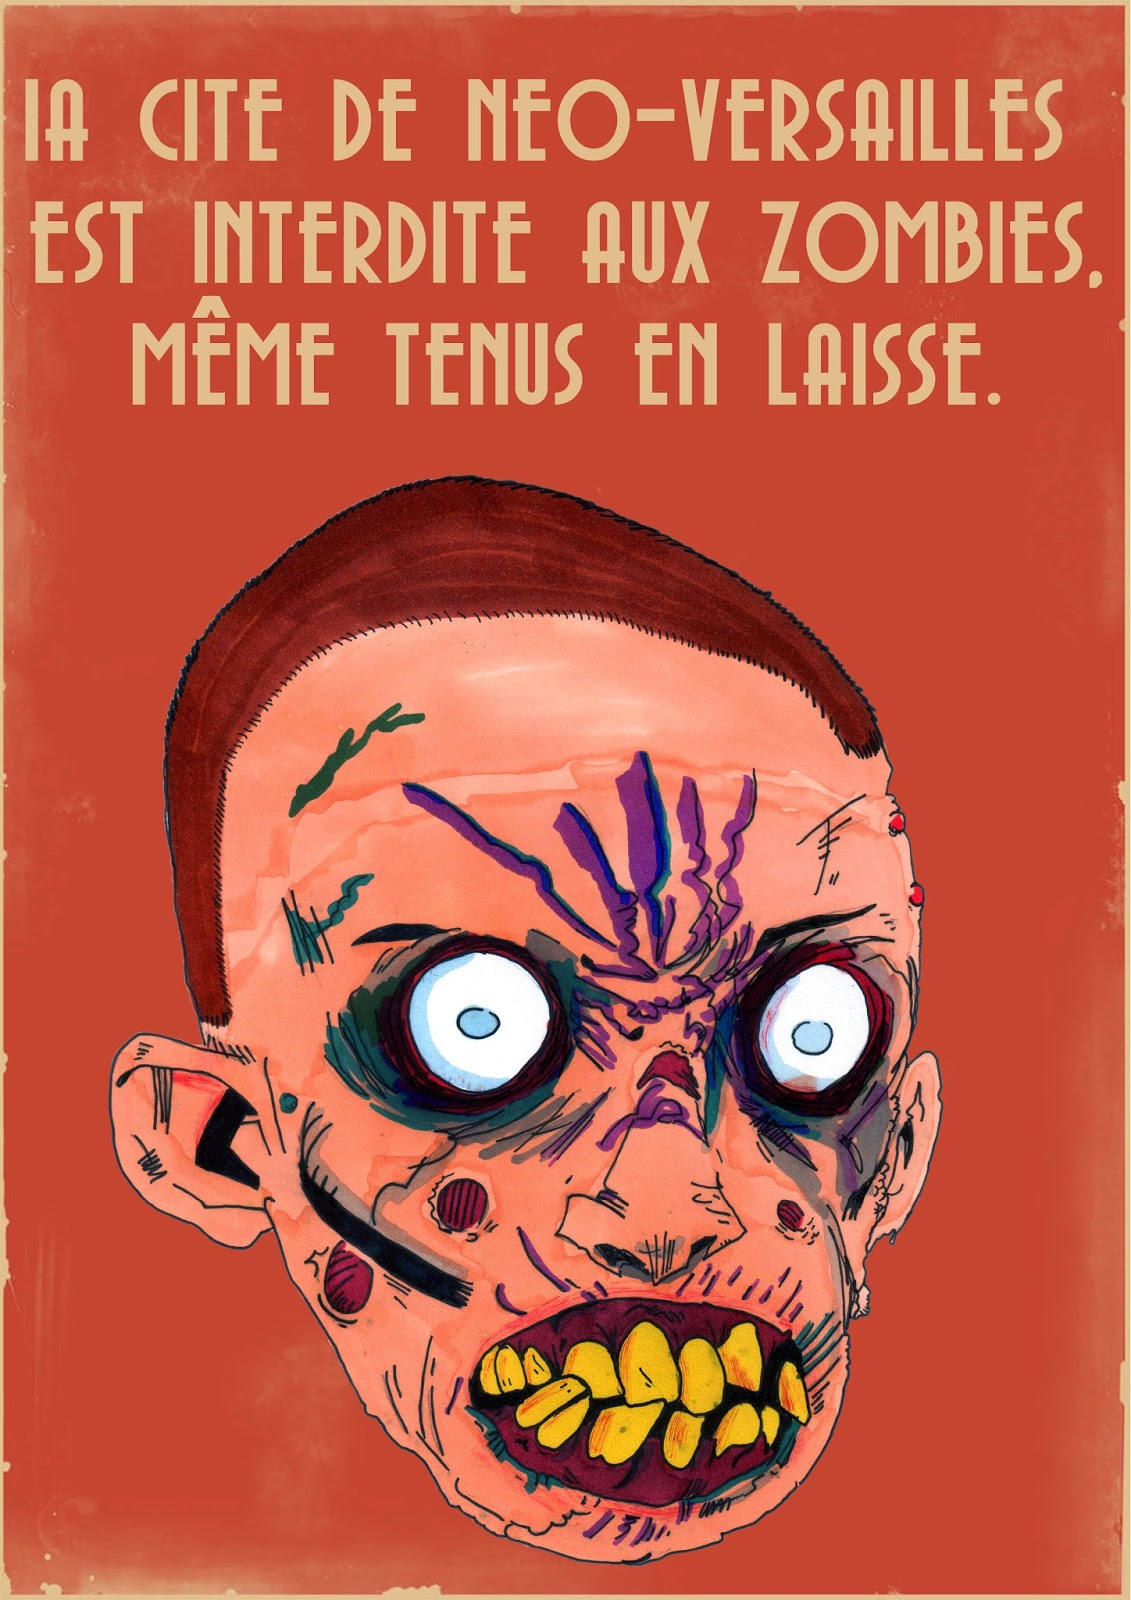 Affiches de propagandes de Neo-Versailles par The Terror Geek Neoversailles5